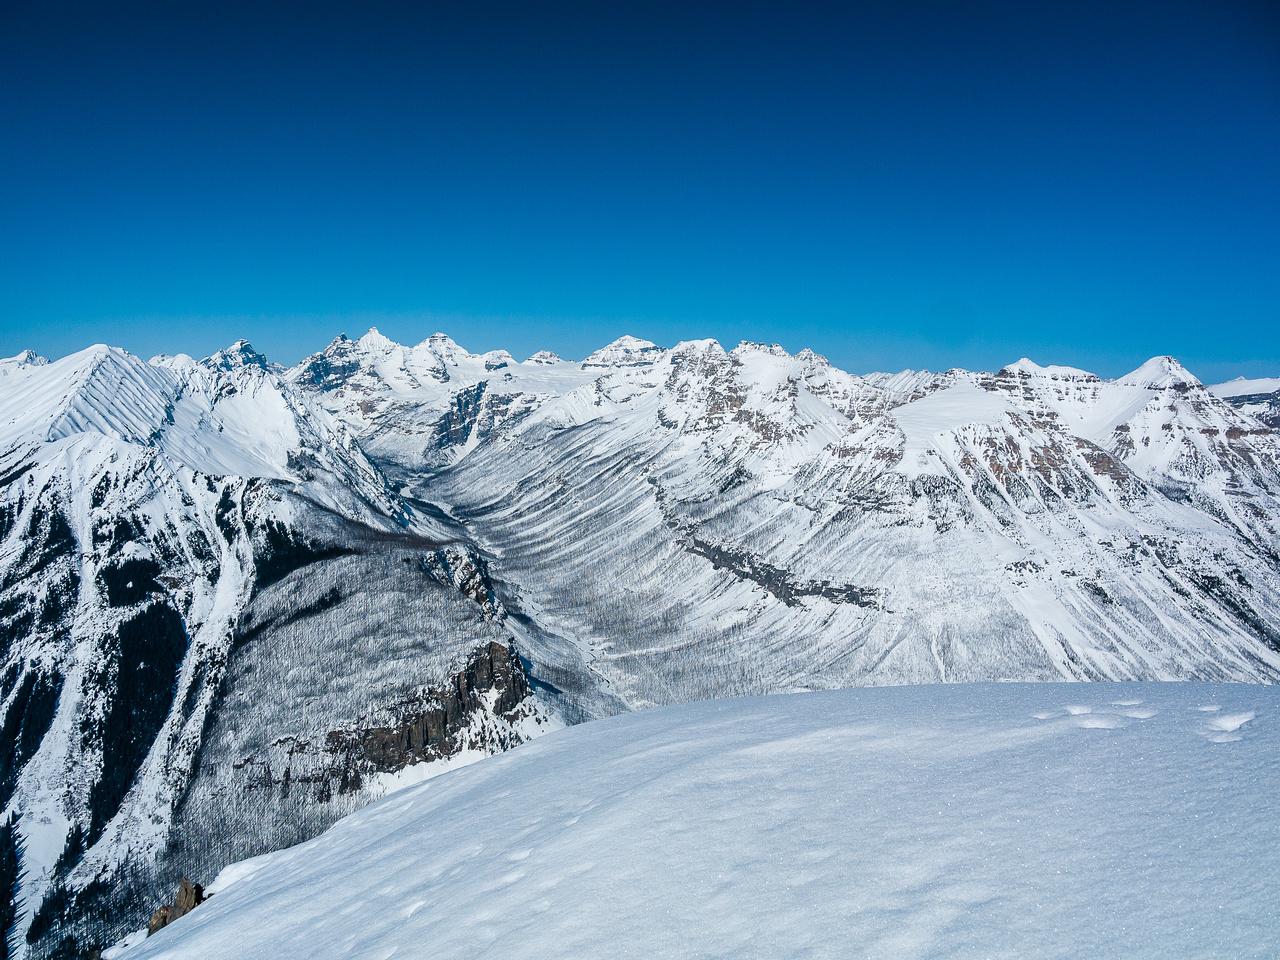 Views up Tokumm Creek to the Fay Glacier include Hungabee, Deltaform, Allan, Perren and more.